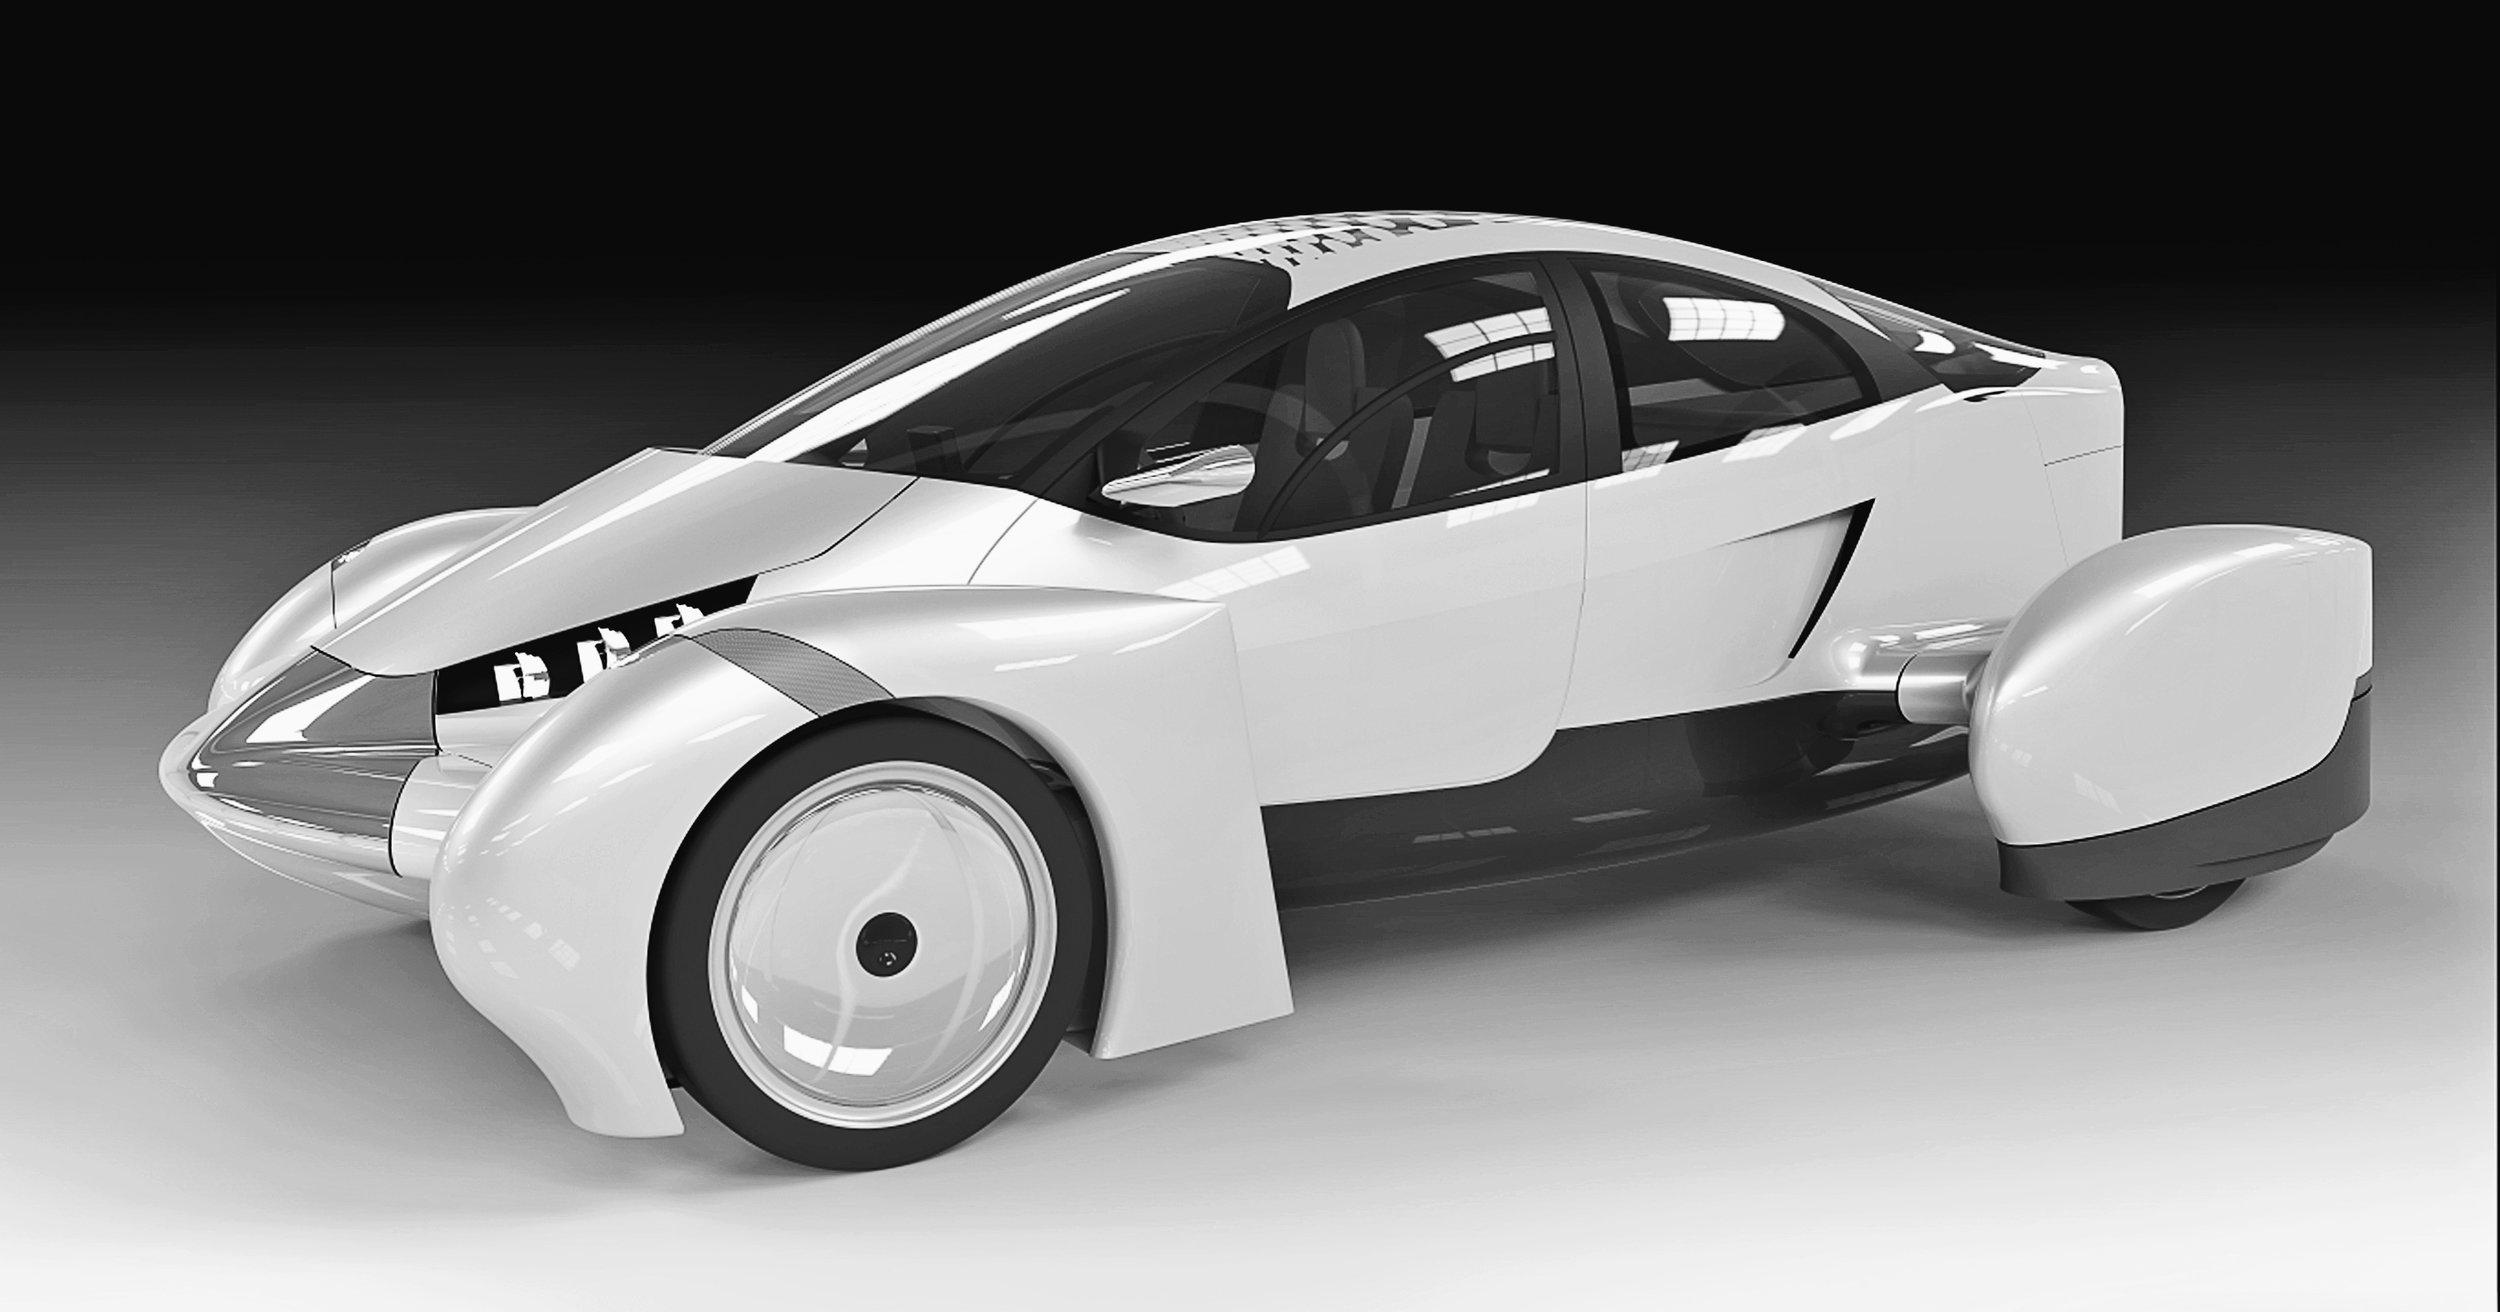 Edison2 Very Light Car render